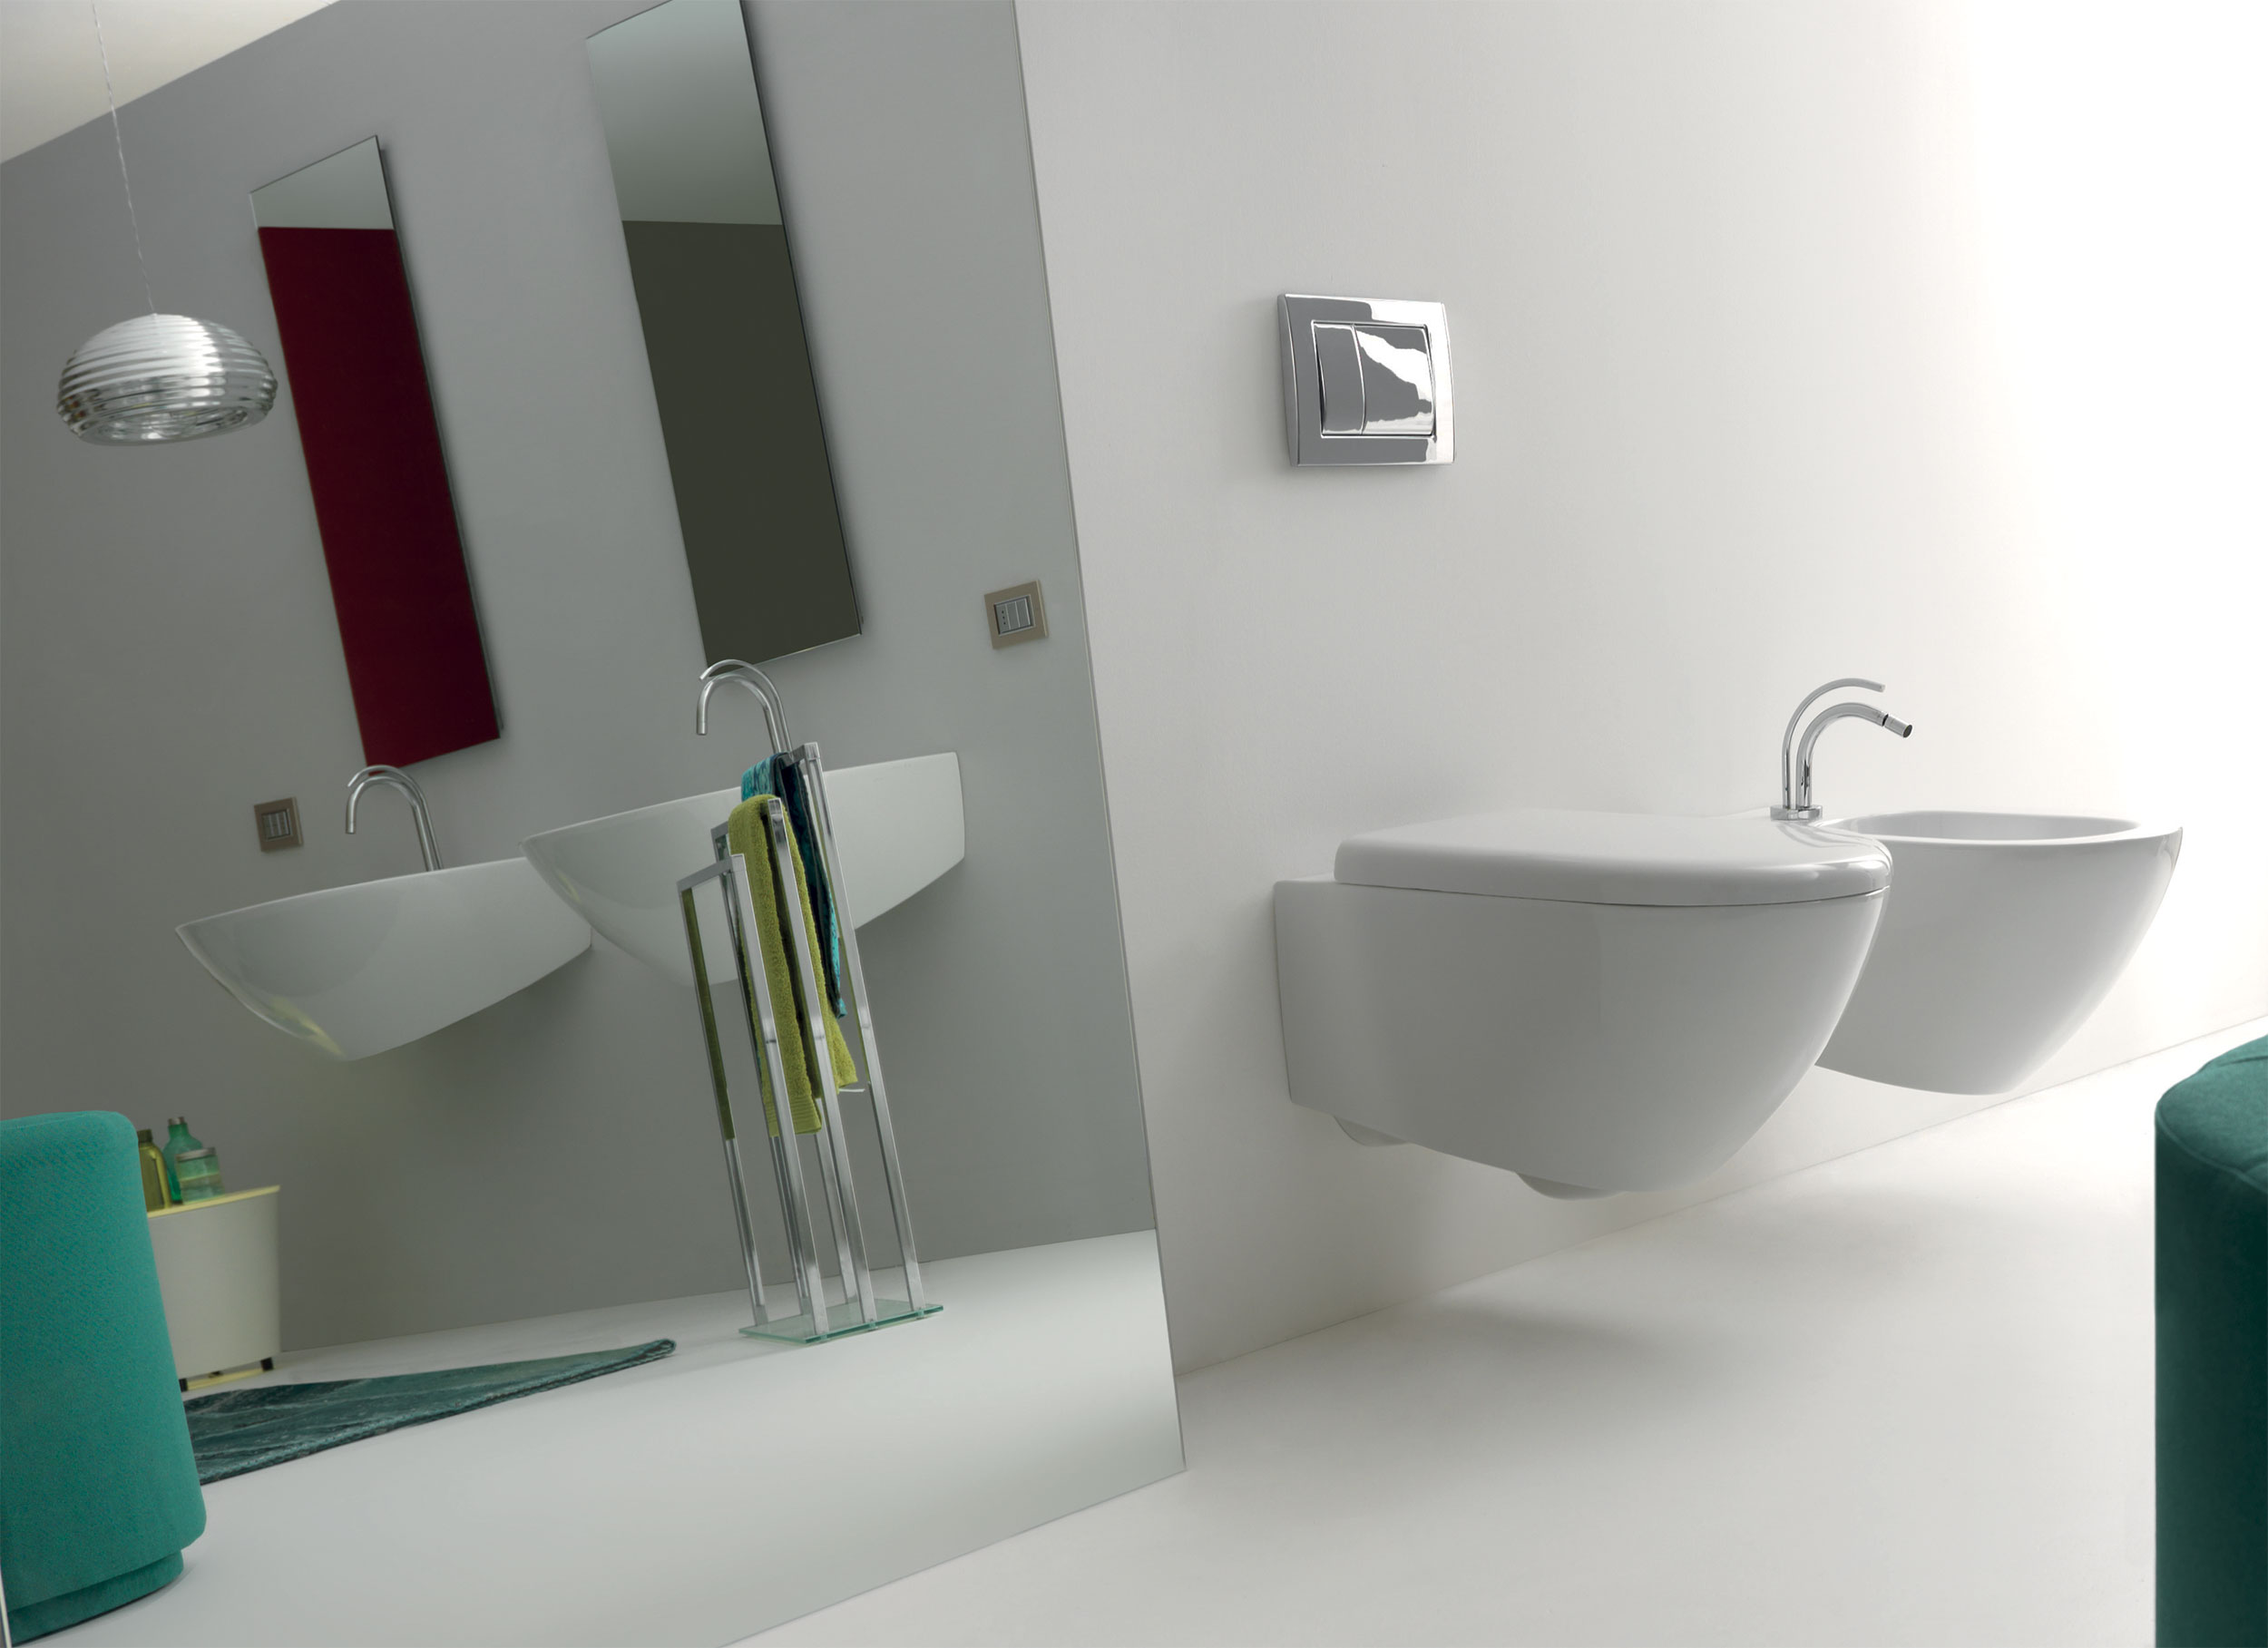 Vasca Da Bagno Kerasan : Aquatech lavabi e sanitari moderni